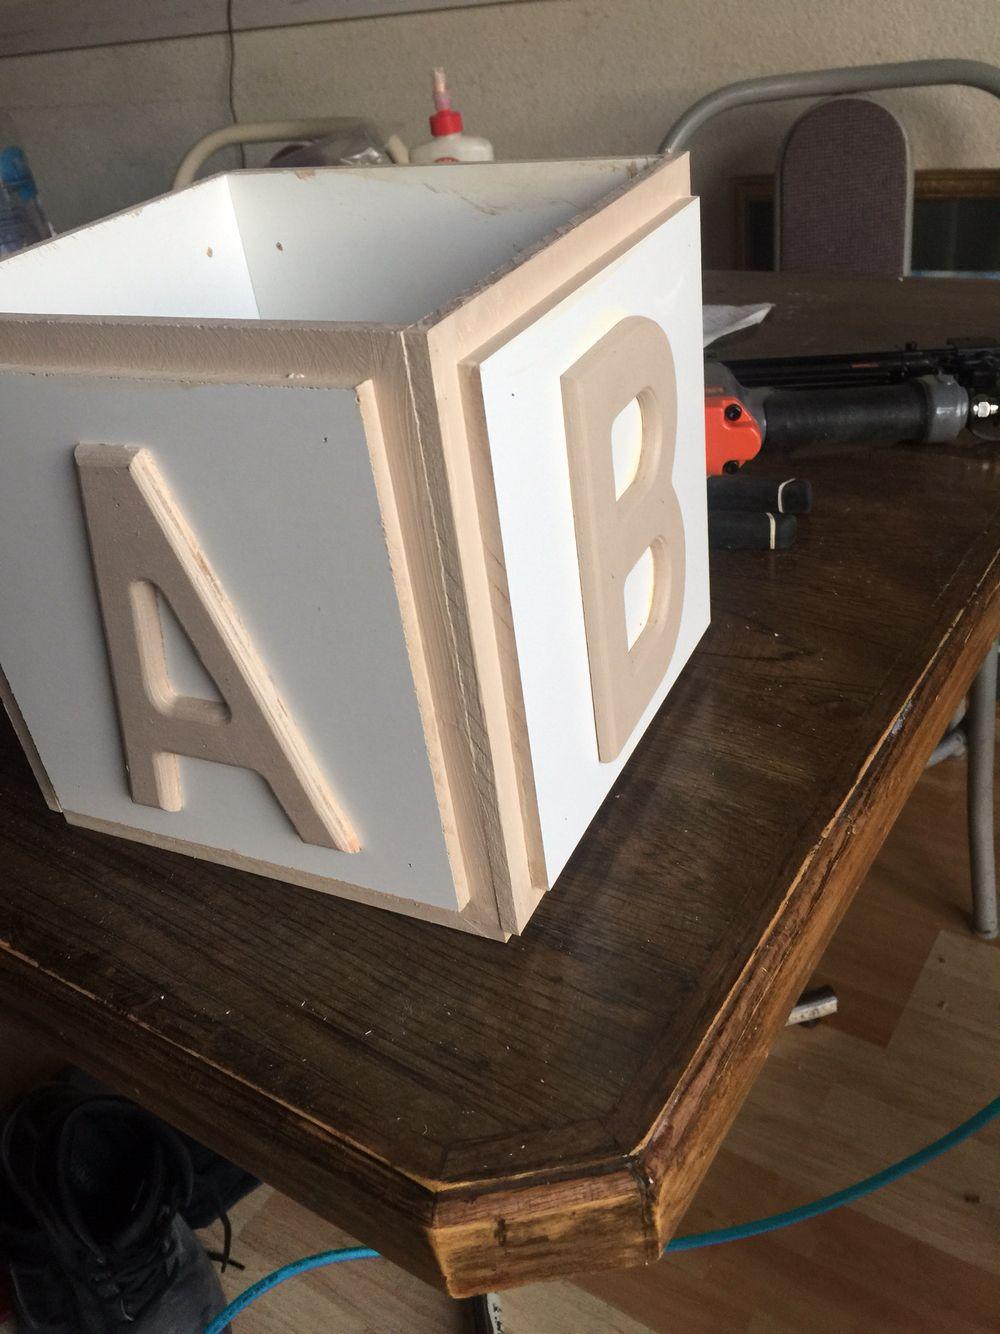 White And Cream Baby Block Centerpiece For Babyshower Baby Blocks Baby Shower Pink Baby Shower Wooden Baby Blocks